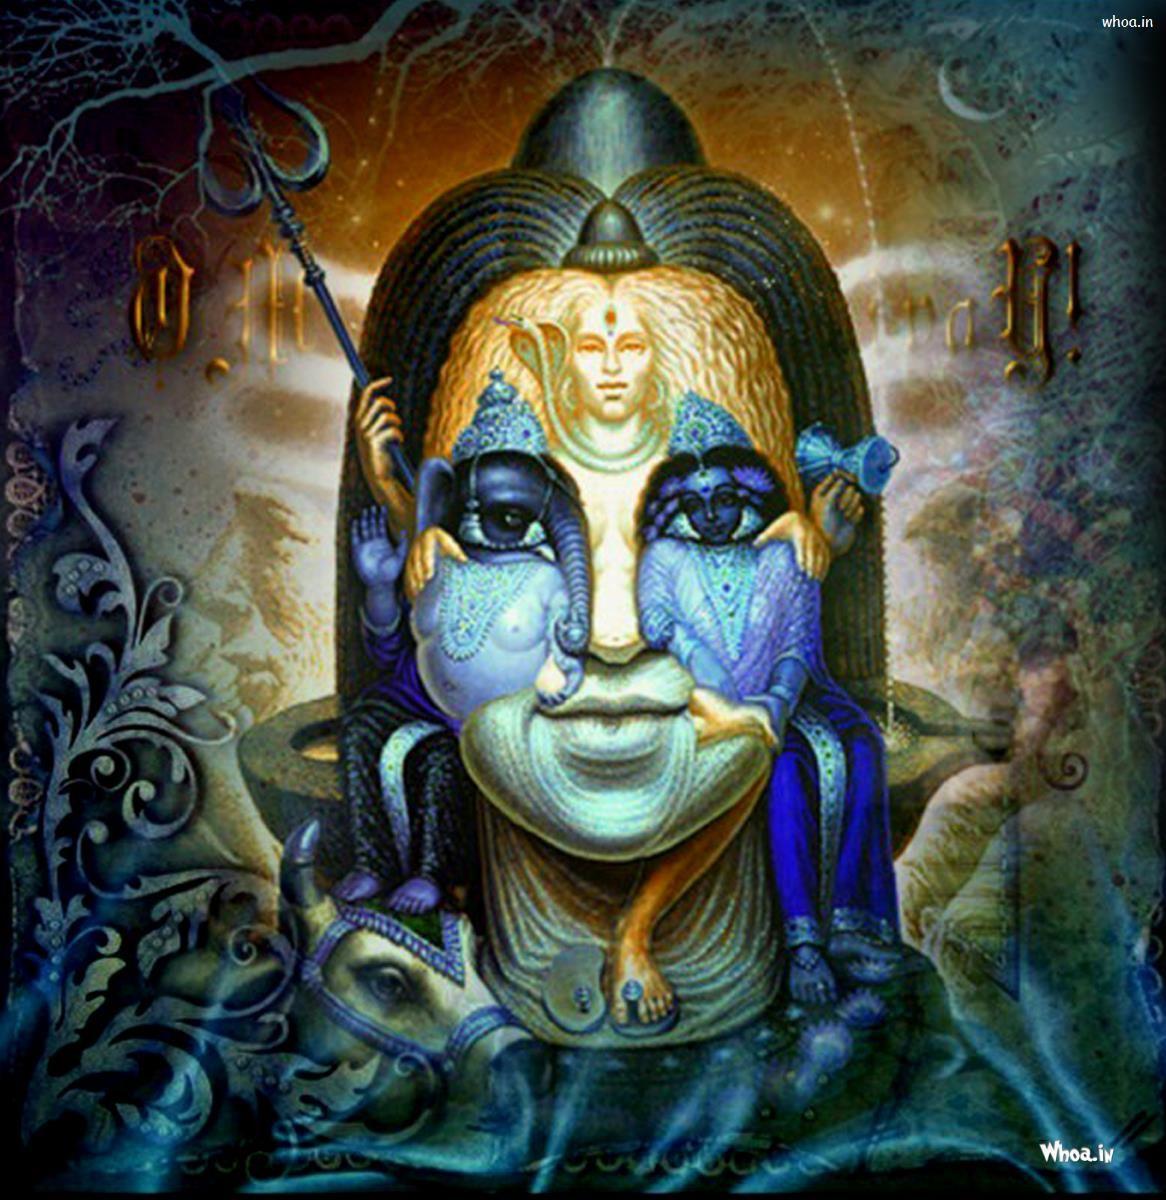 Popular Wallpaper Angry Shiva - c2dcba3d336e447eefa2c016a1460962  Collection_722722      .jpg